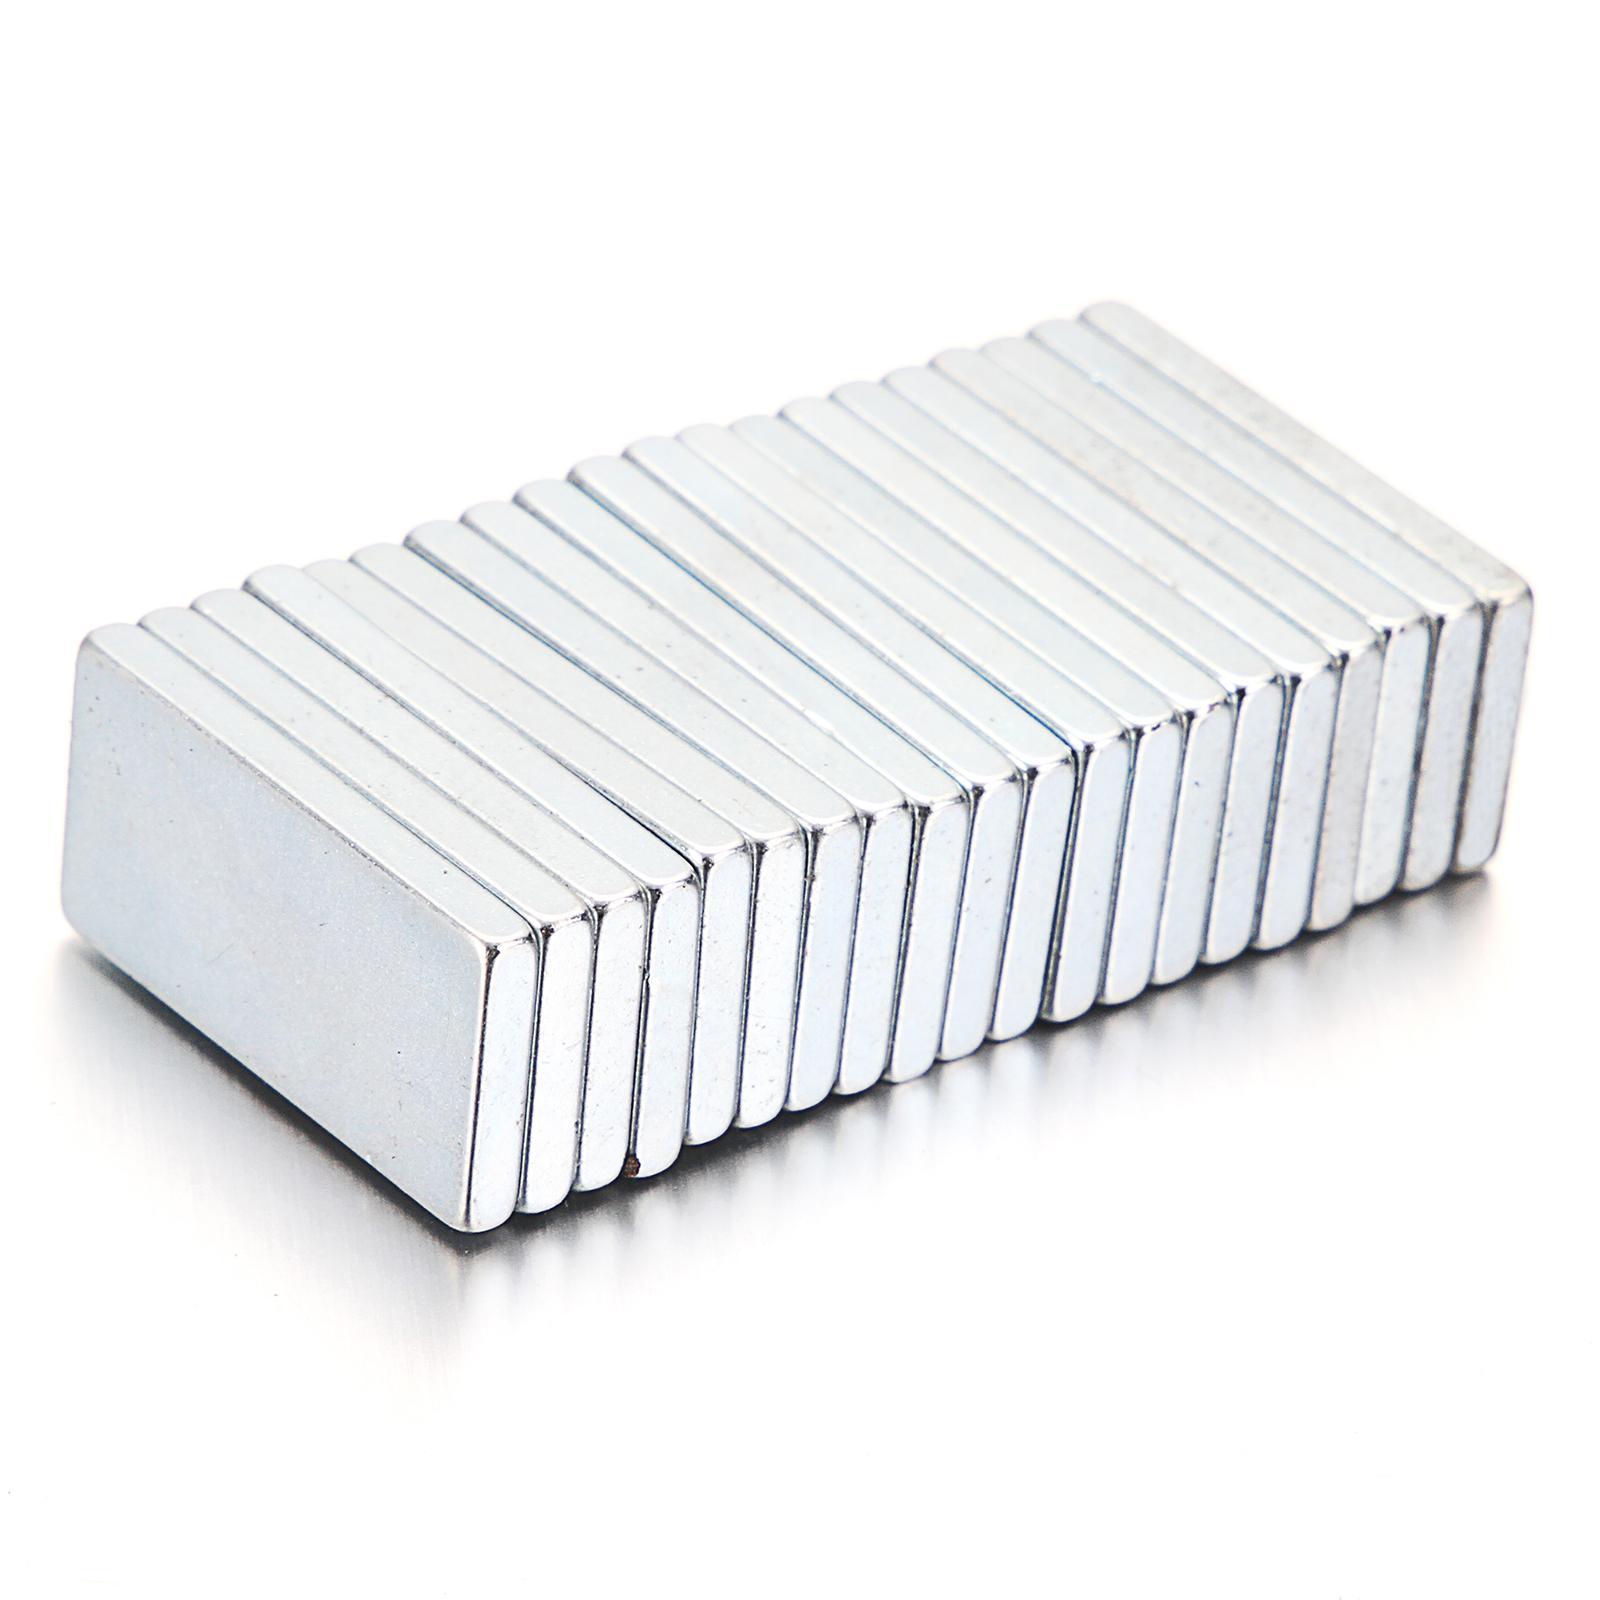 Brand new 5/10 / 20pcs Super Strong Block Fridge Magnets Rare Earth Neodimio 20x10x2mm